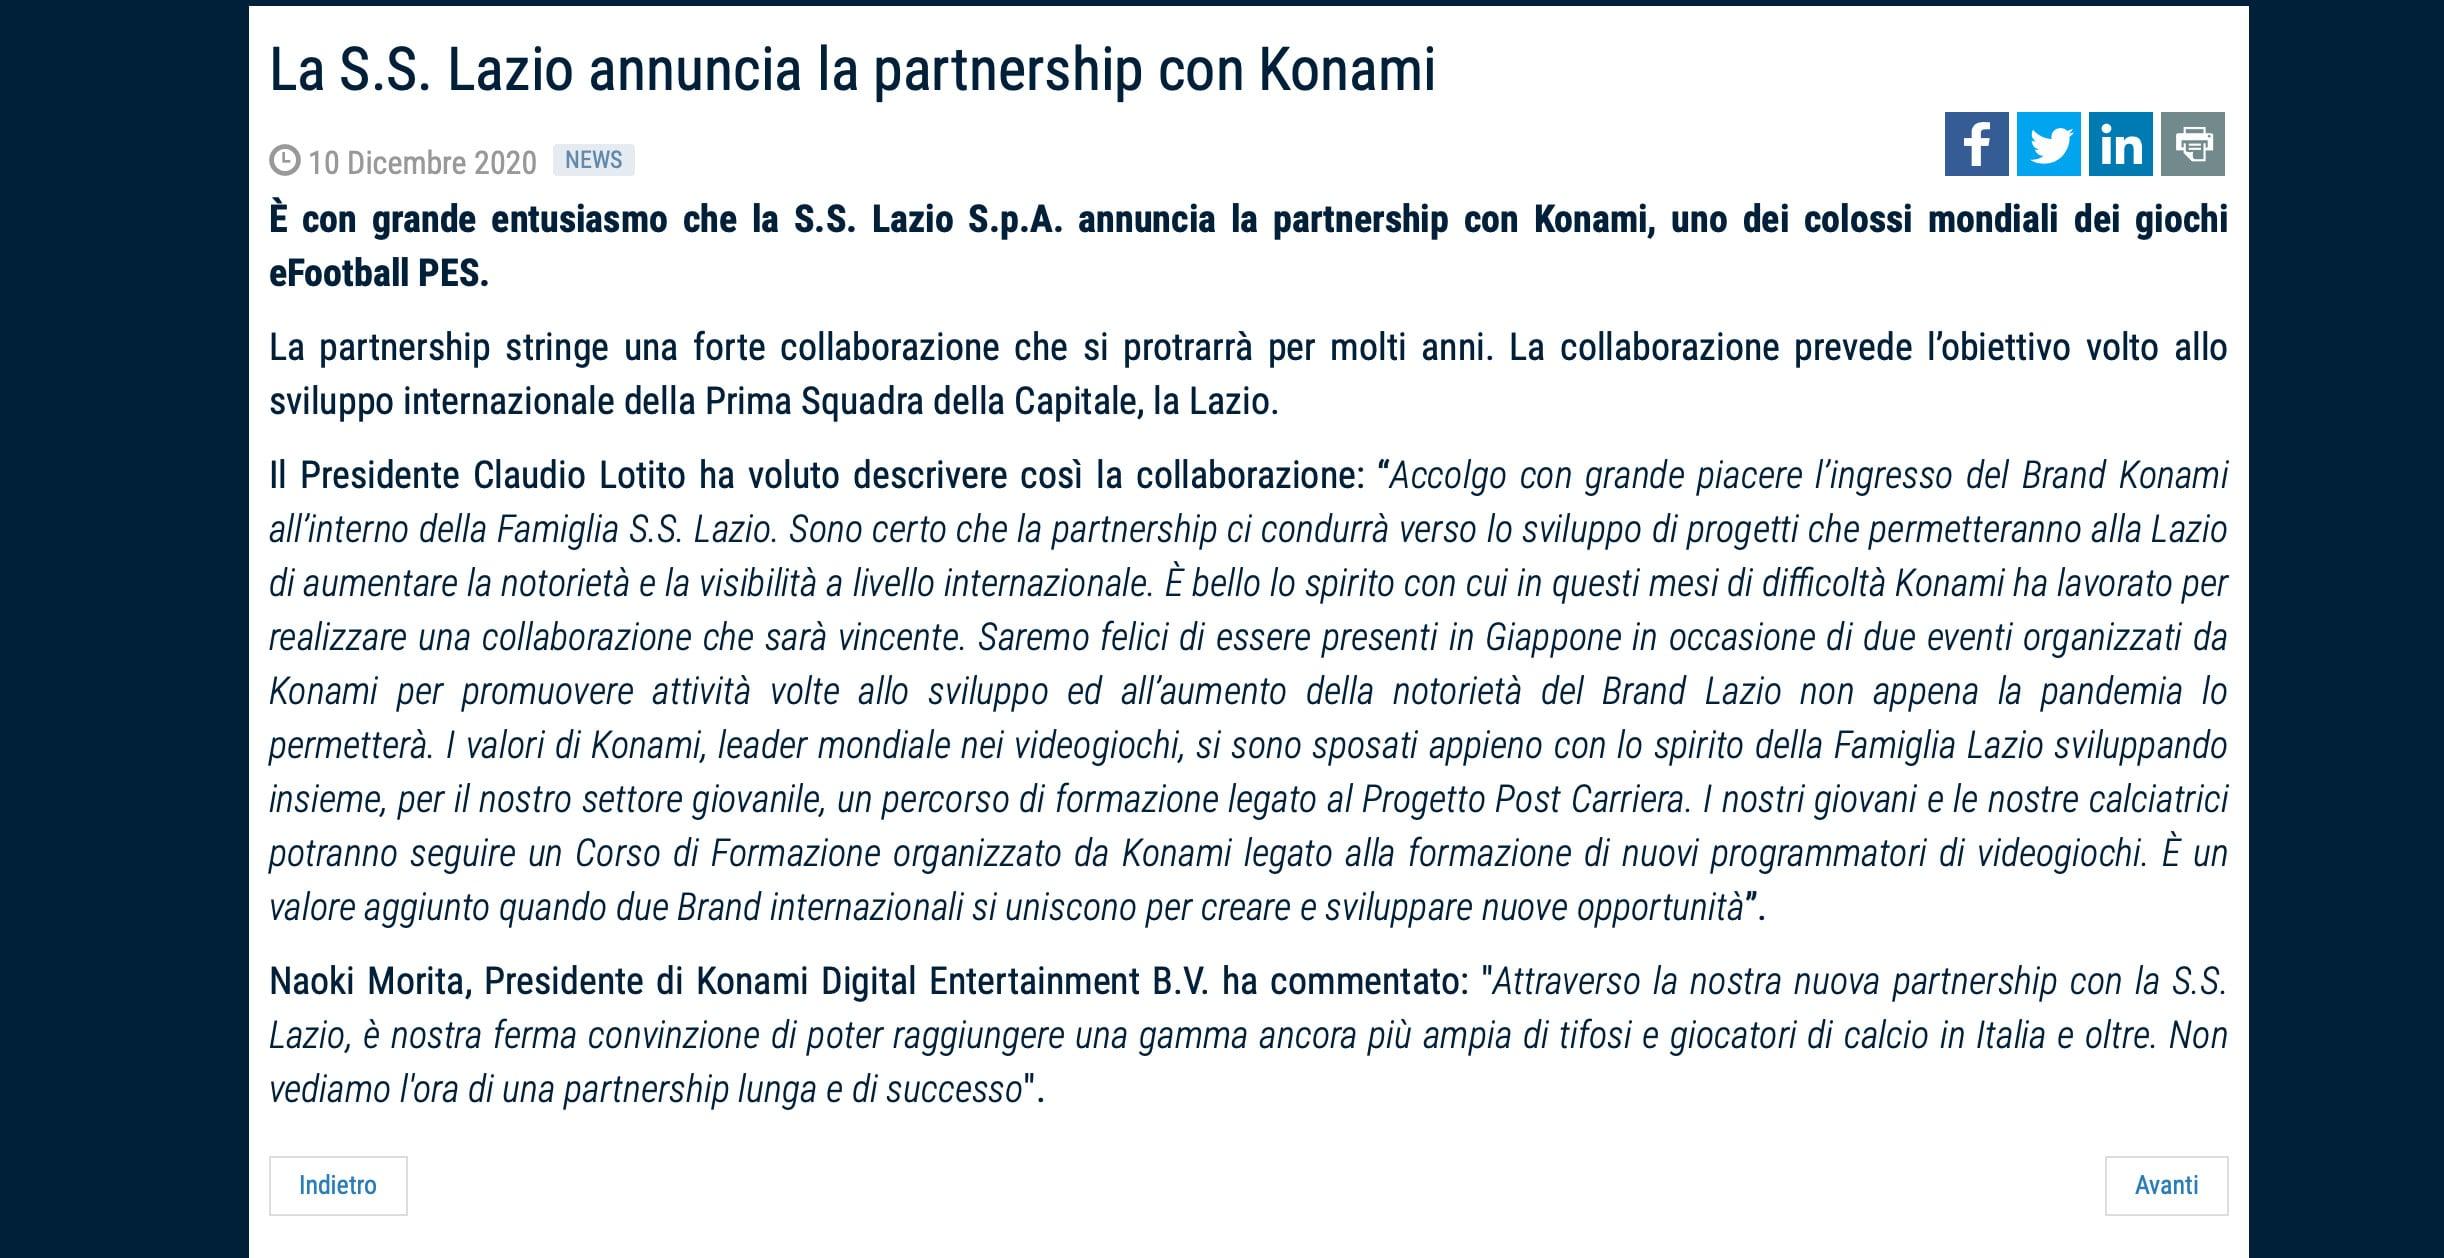 Lazio, siglata una partnership con Konami